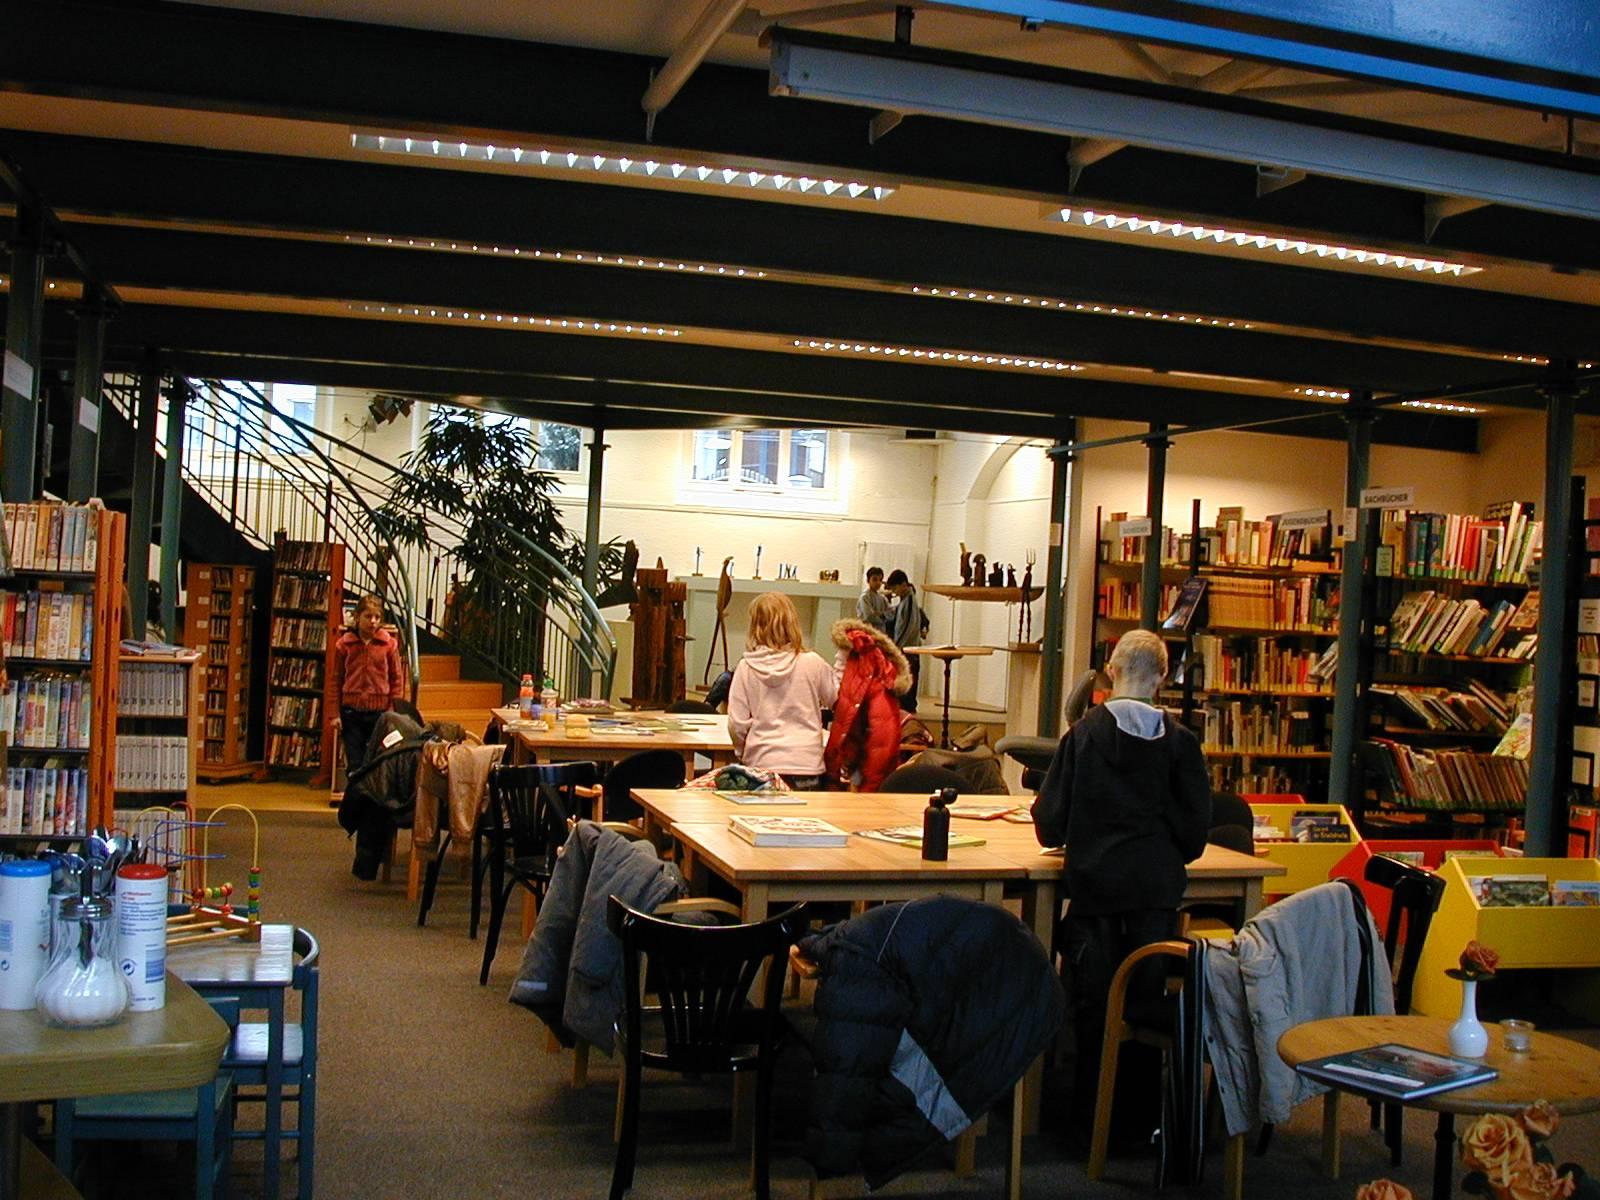 Bibliothek im Kulturhaus Walle Brodelpott